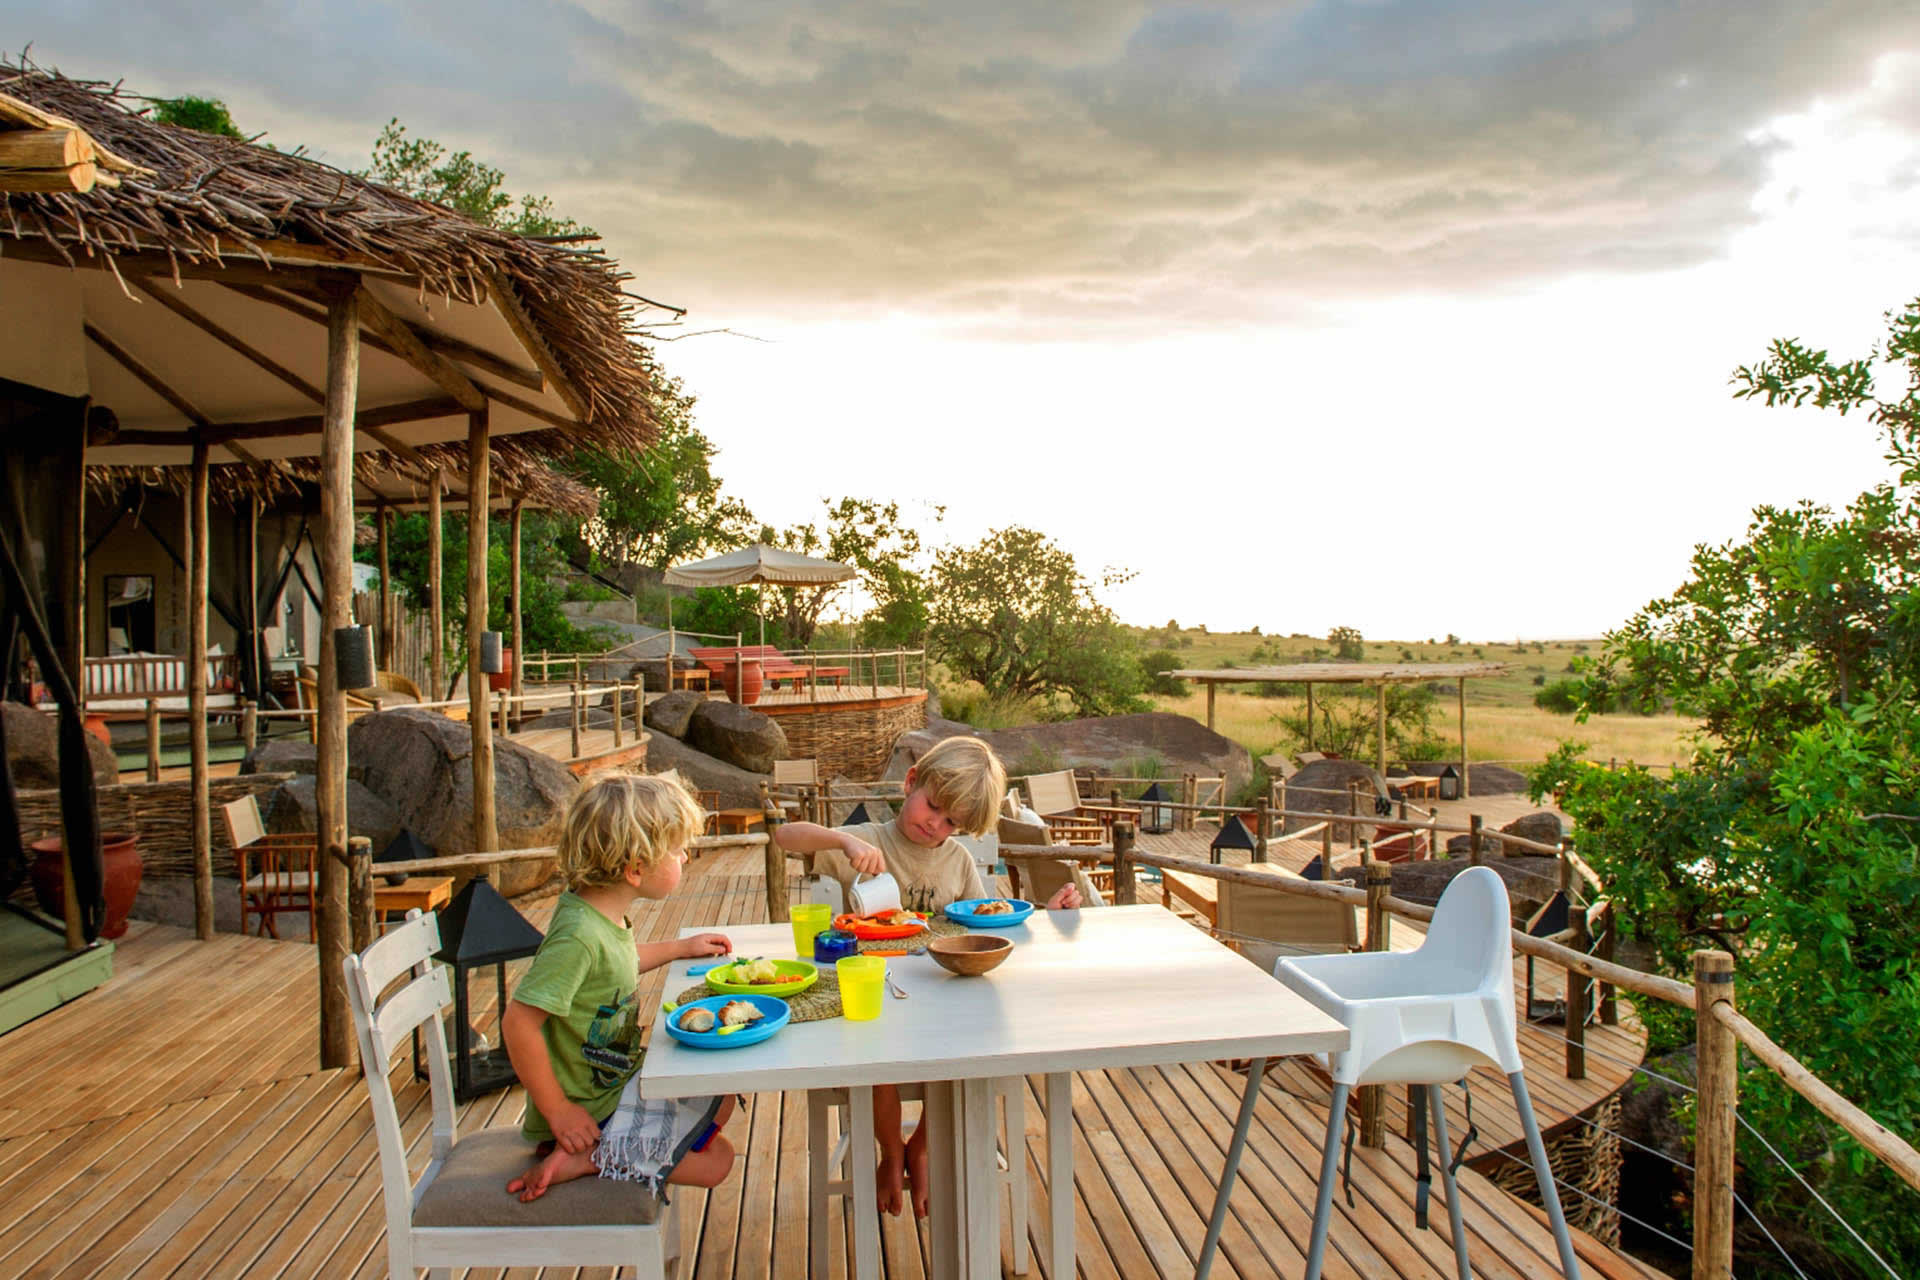 10 Days Tanzania Family Safari And Zanzibar Beach Holiday.